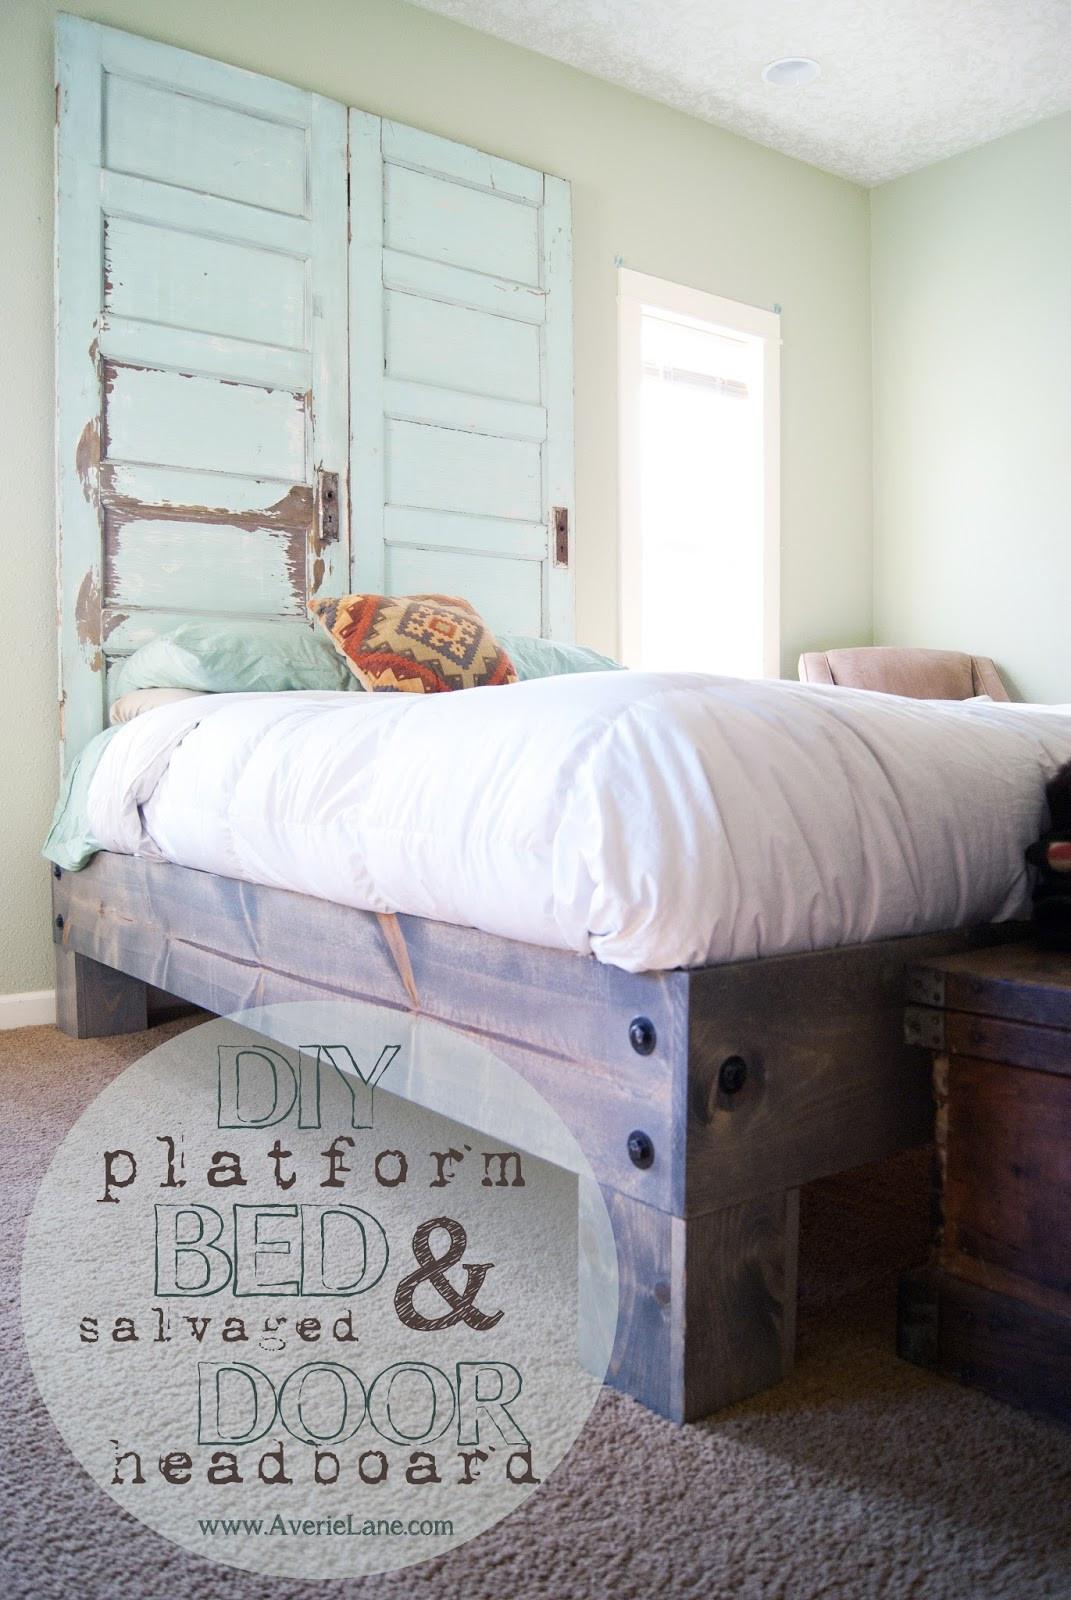 Best ideas about DIY Platform Bed . Save or Pin DIY Platform Bed & Salvaged Door Headboard part one Now.